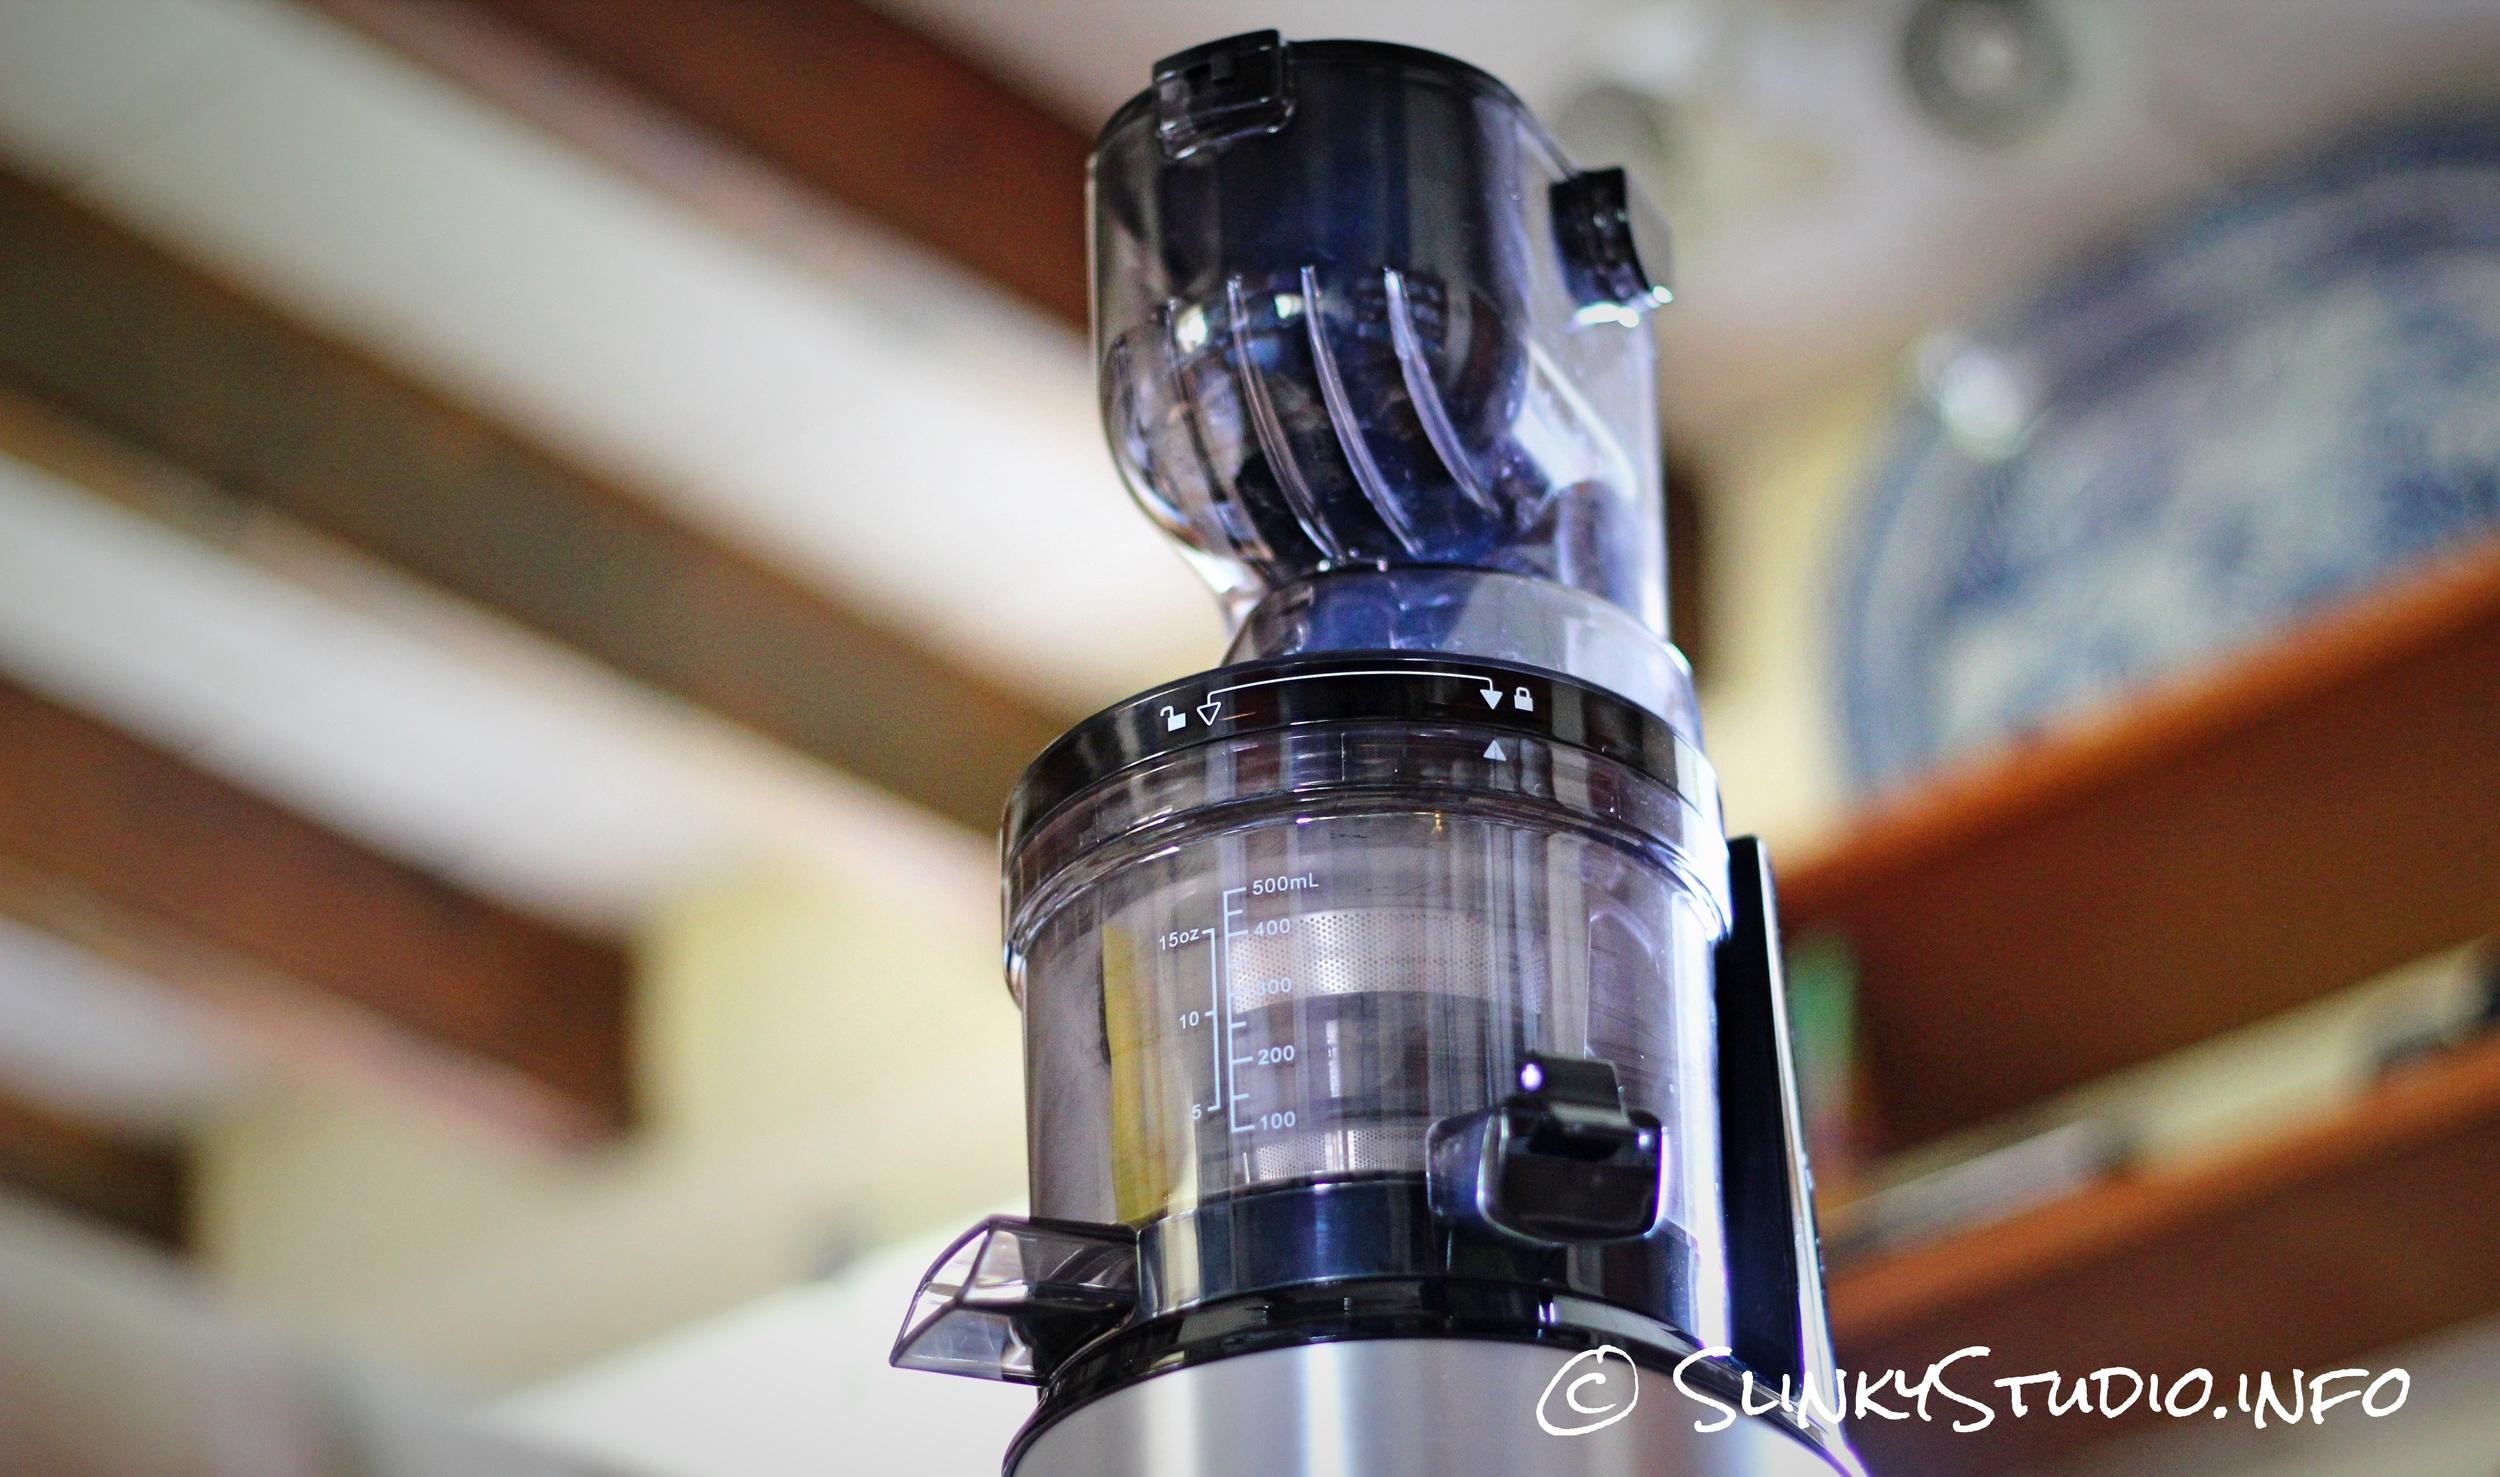 Optimum 700 Advanced Juicer Upward Ceiling Angle.jpg